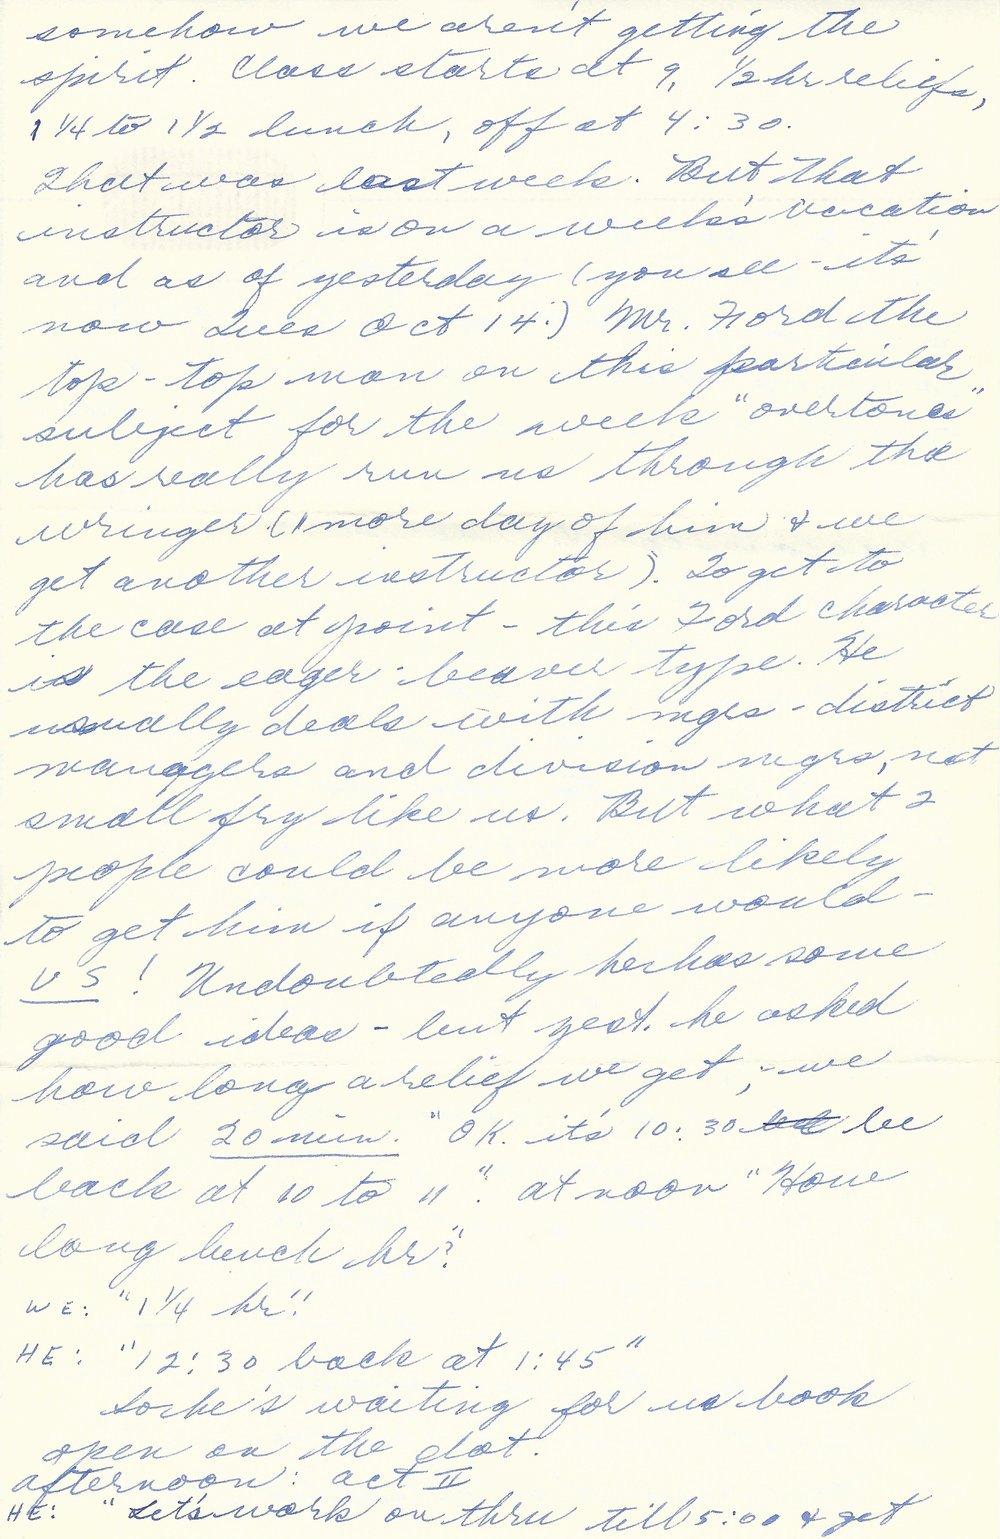 7. Oct. 9-21, 1952 (Oma)_Page_09.jpg